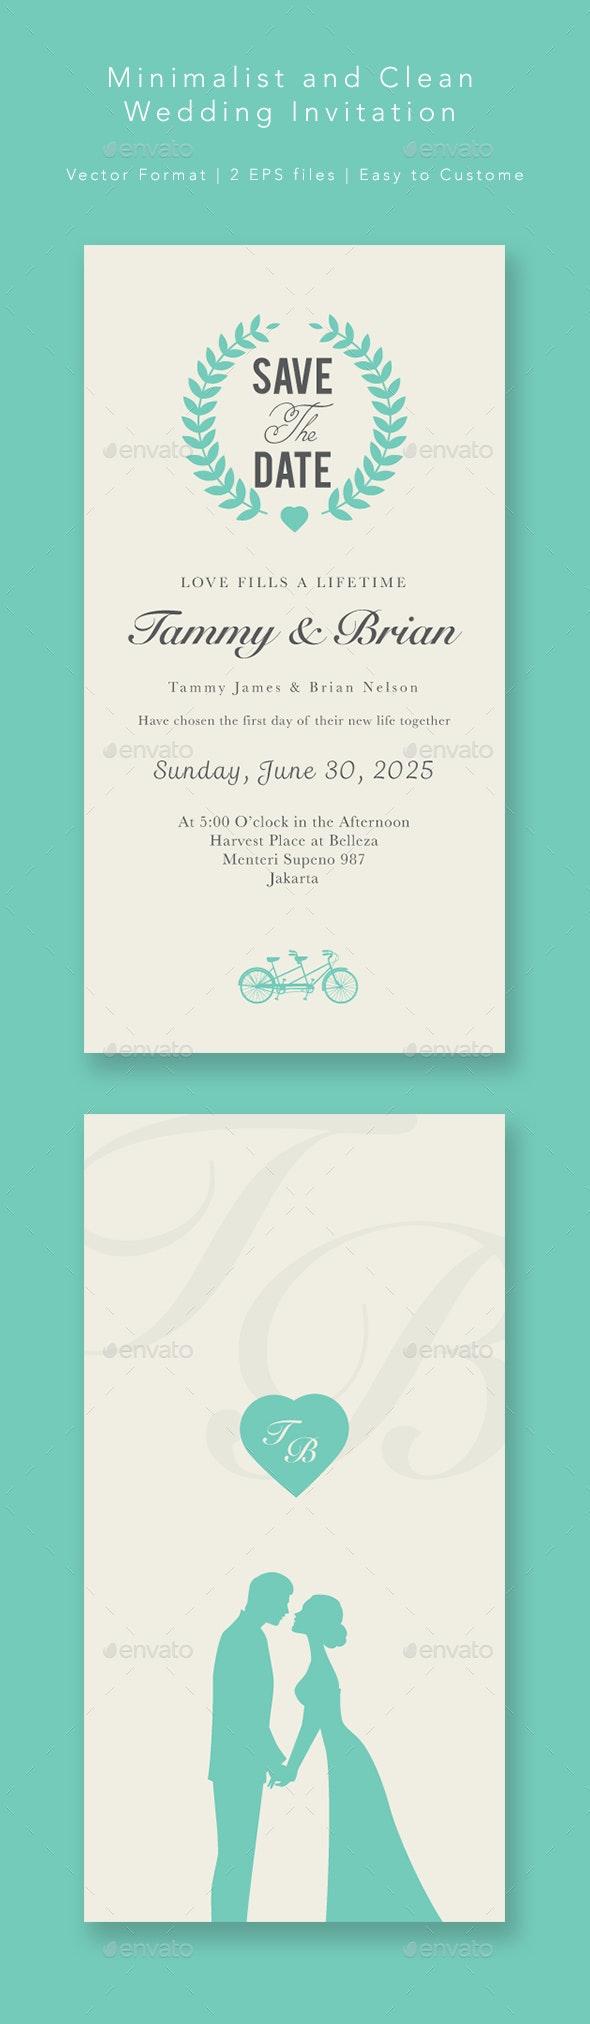 Minimalist Wedding Invitation by peterdraw | GraphicRiver